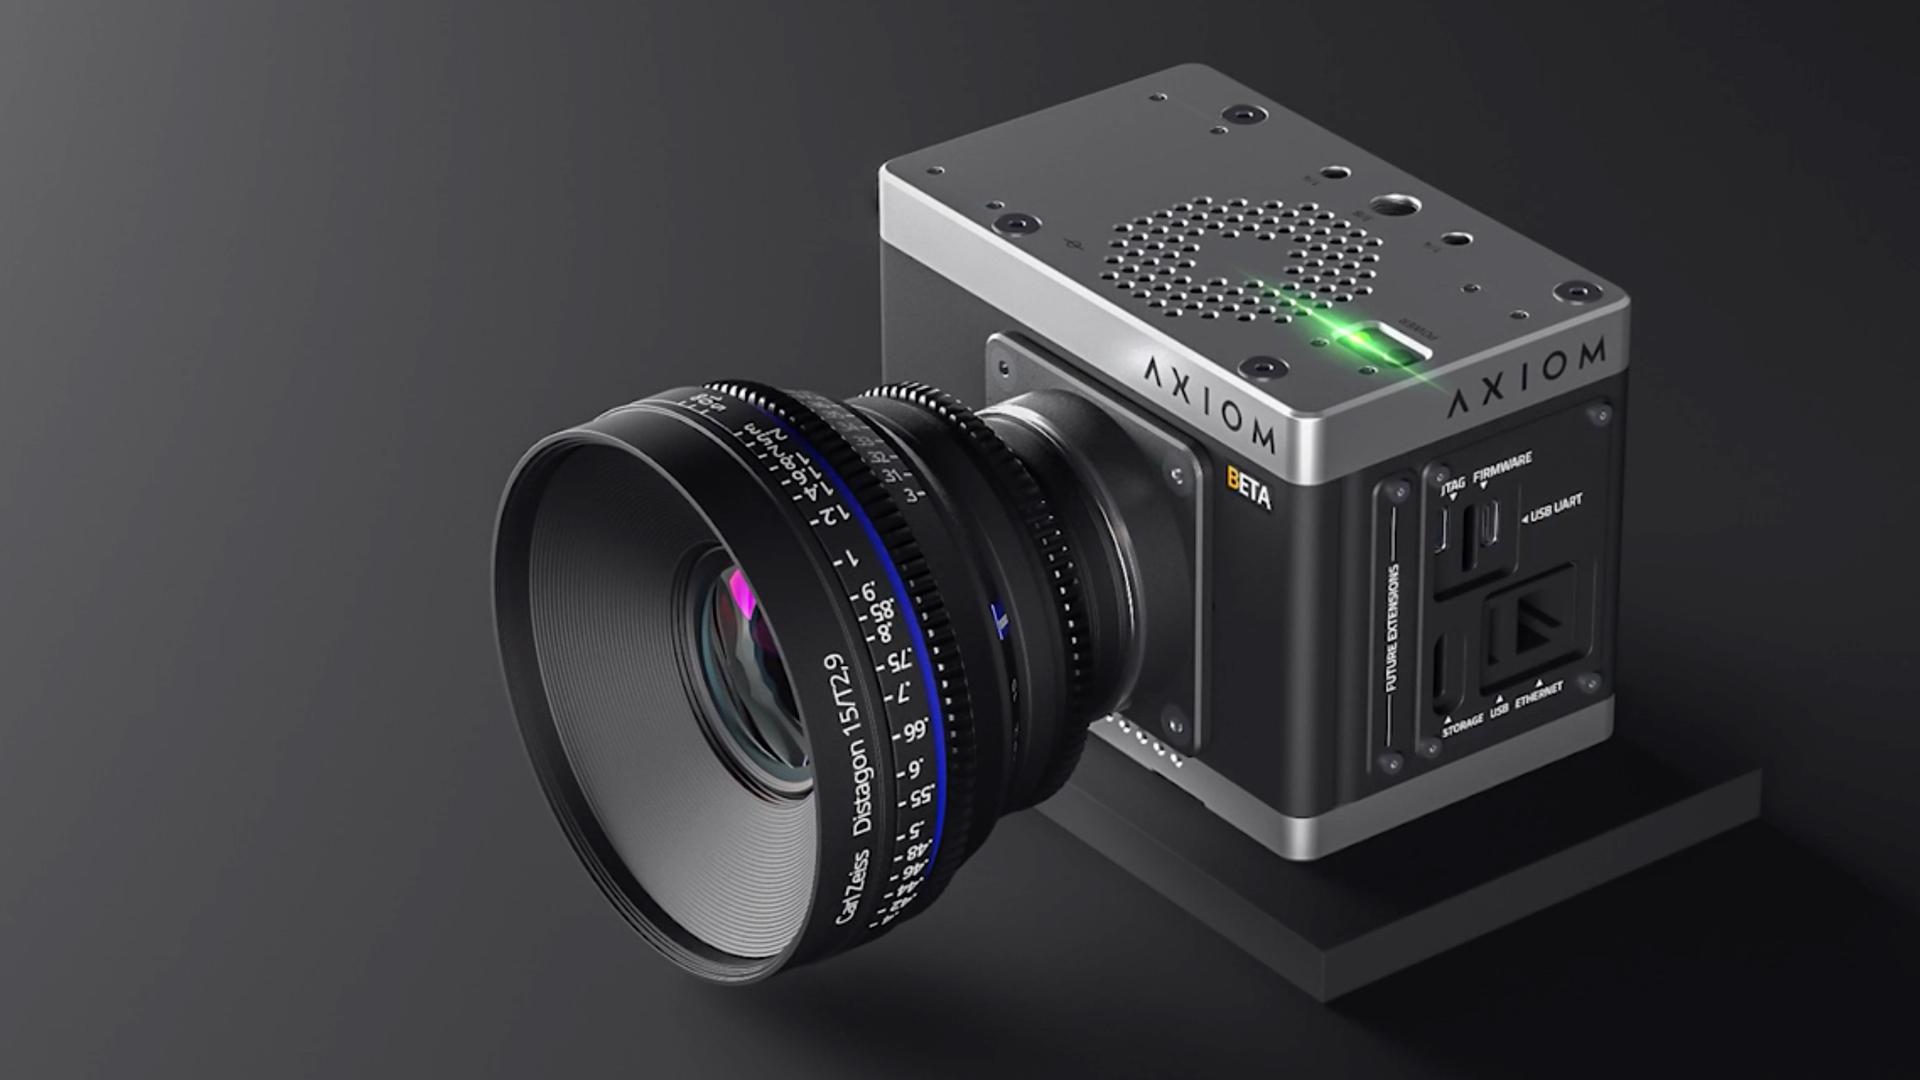 AXIOMオープンソースシネマカメラ - 新しいデザインとレコーディングソリューションを発表